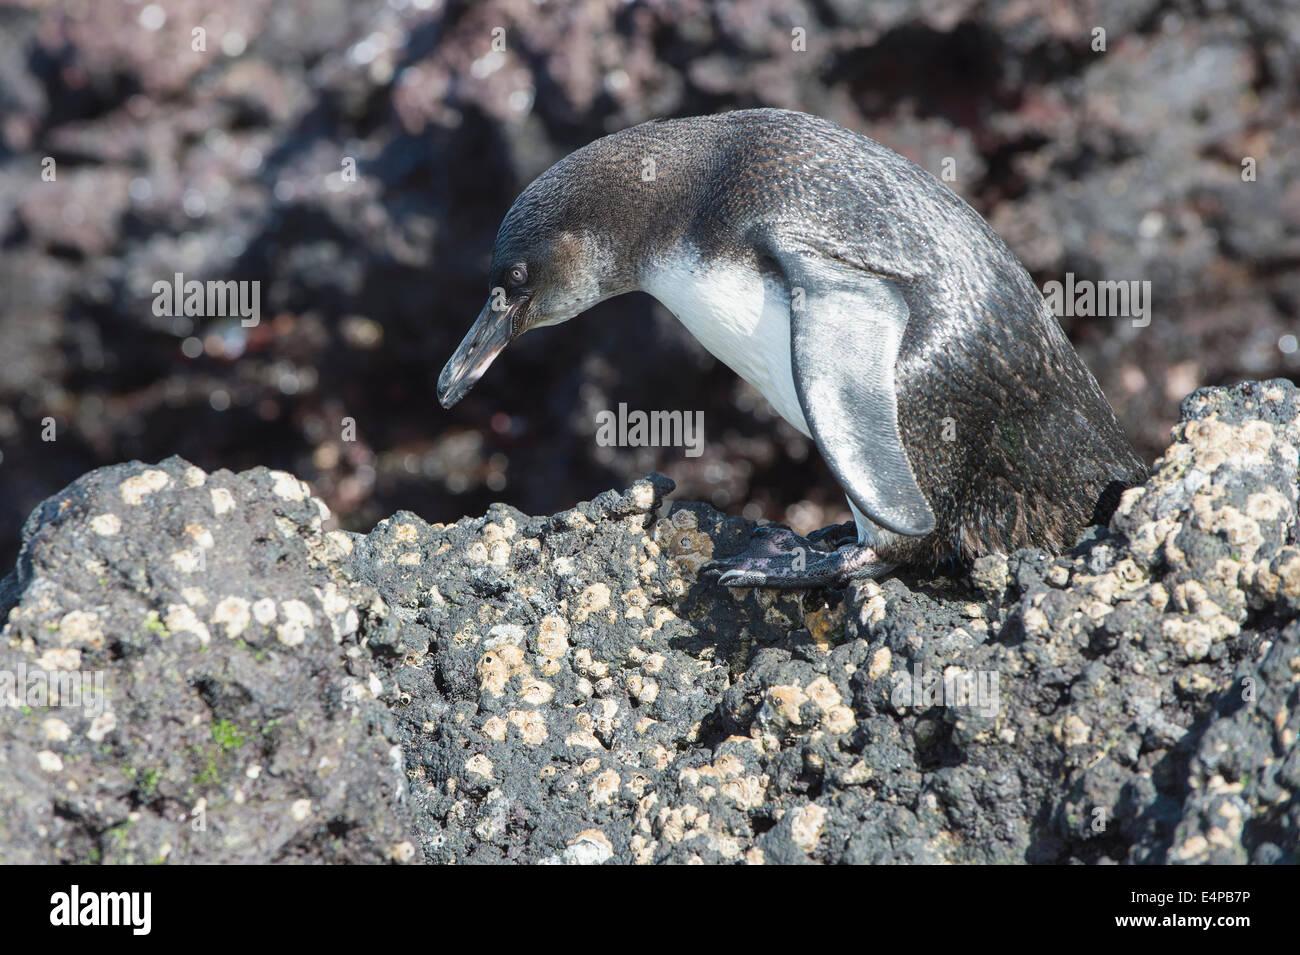 Galapagos Penguin (Spheniscus mendiculus), Elisabeth Bay, Isabela Island, Galapagos, Ecuador - Stock Image